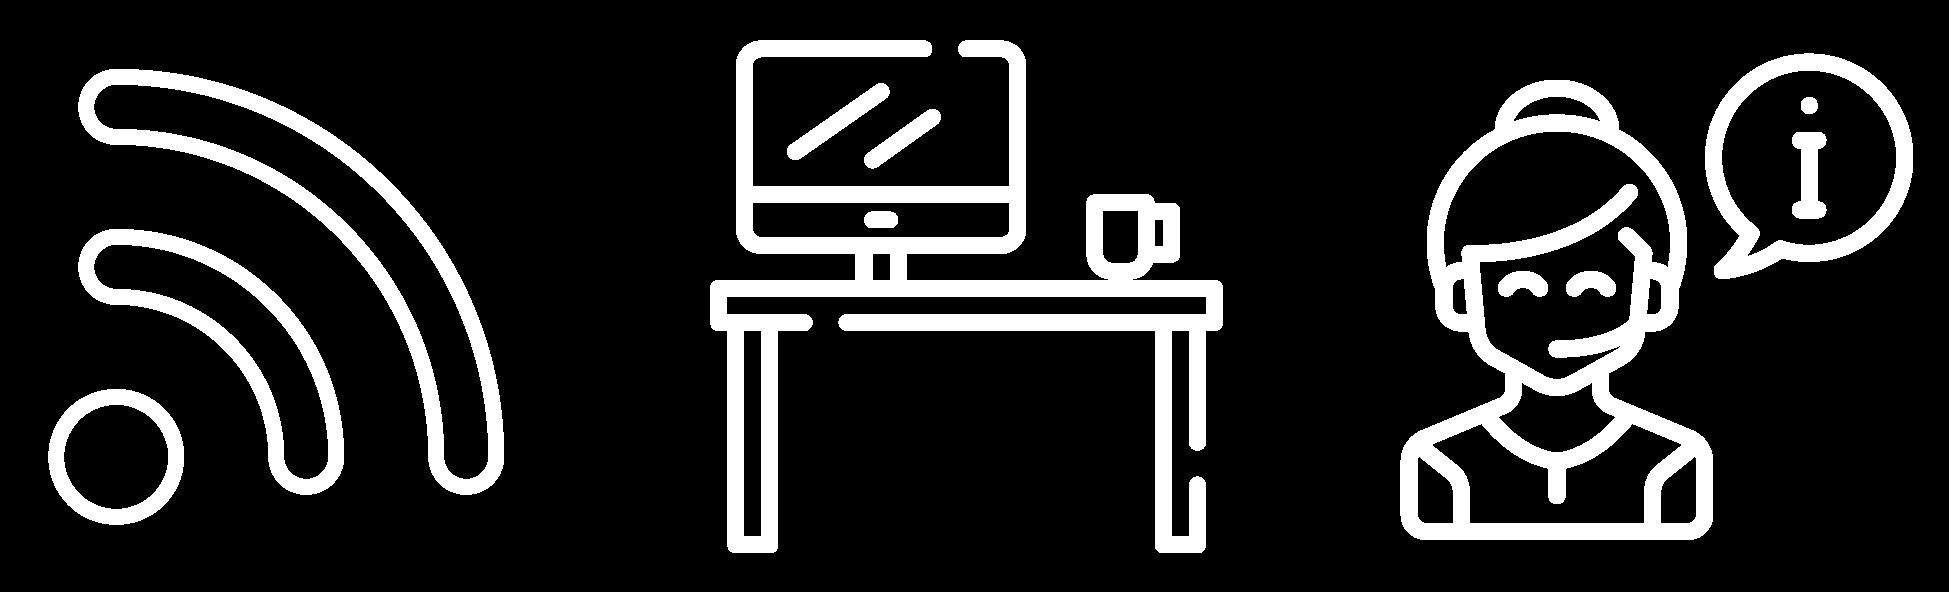 Startpoint Servicios Coworking por Día